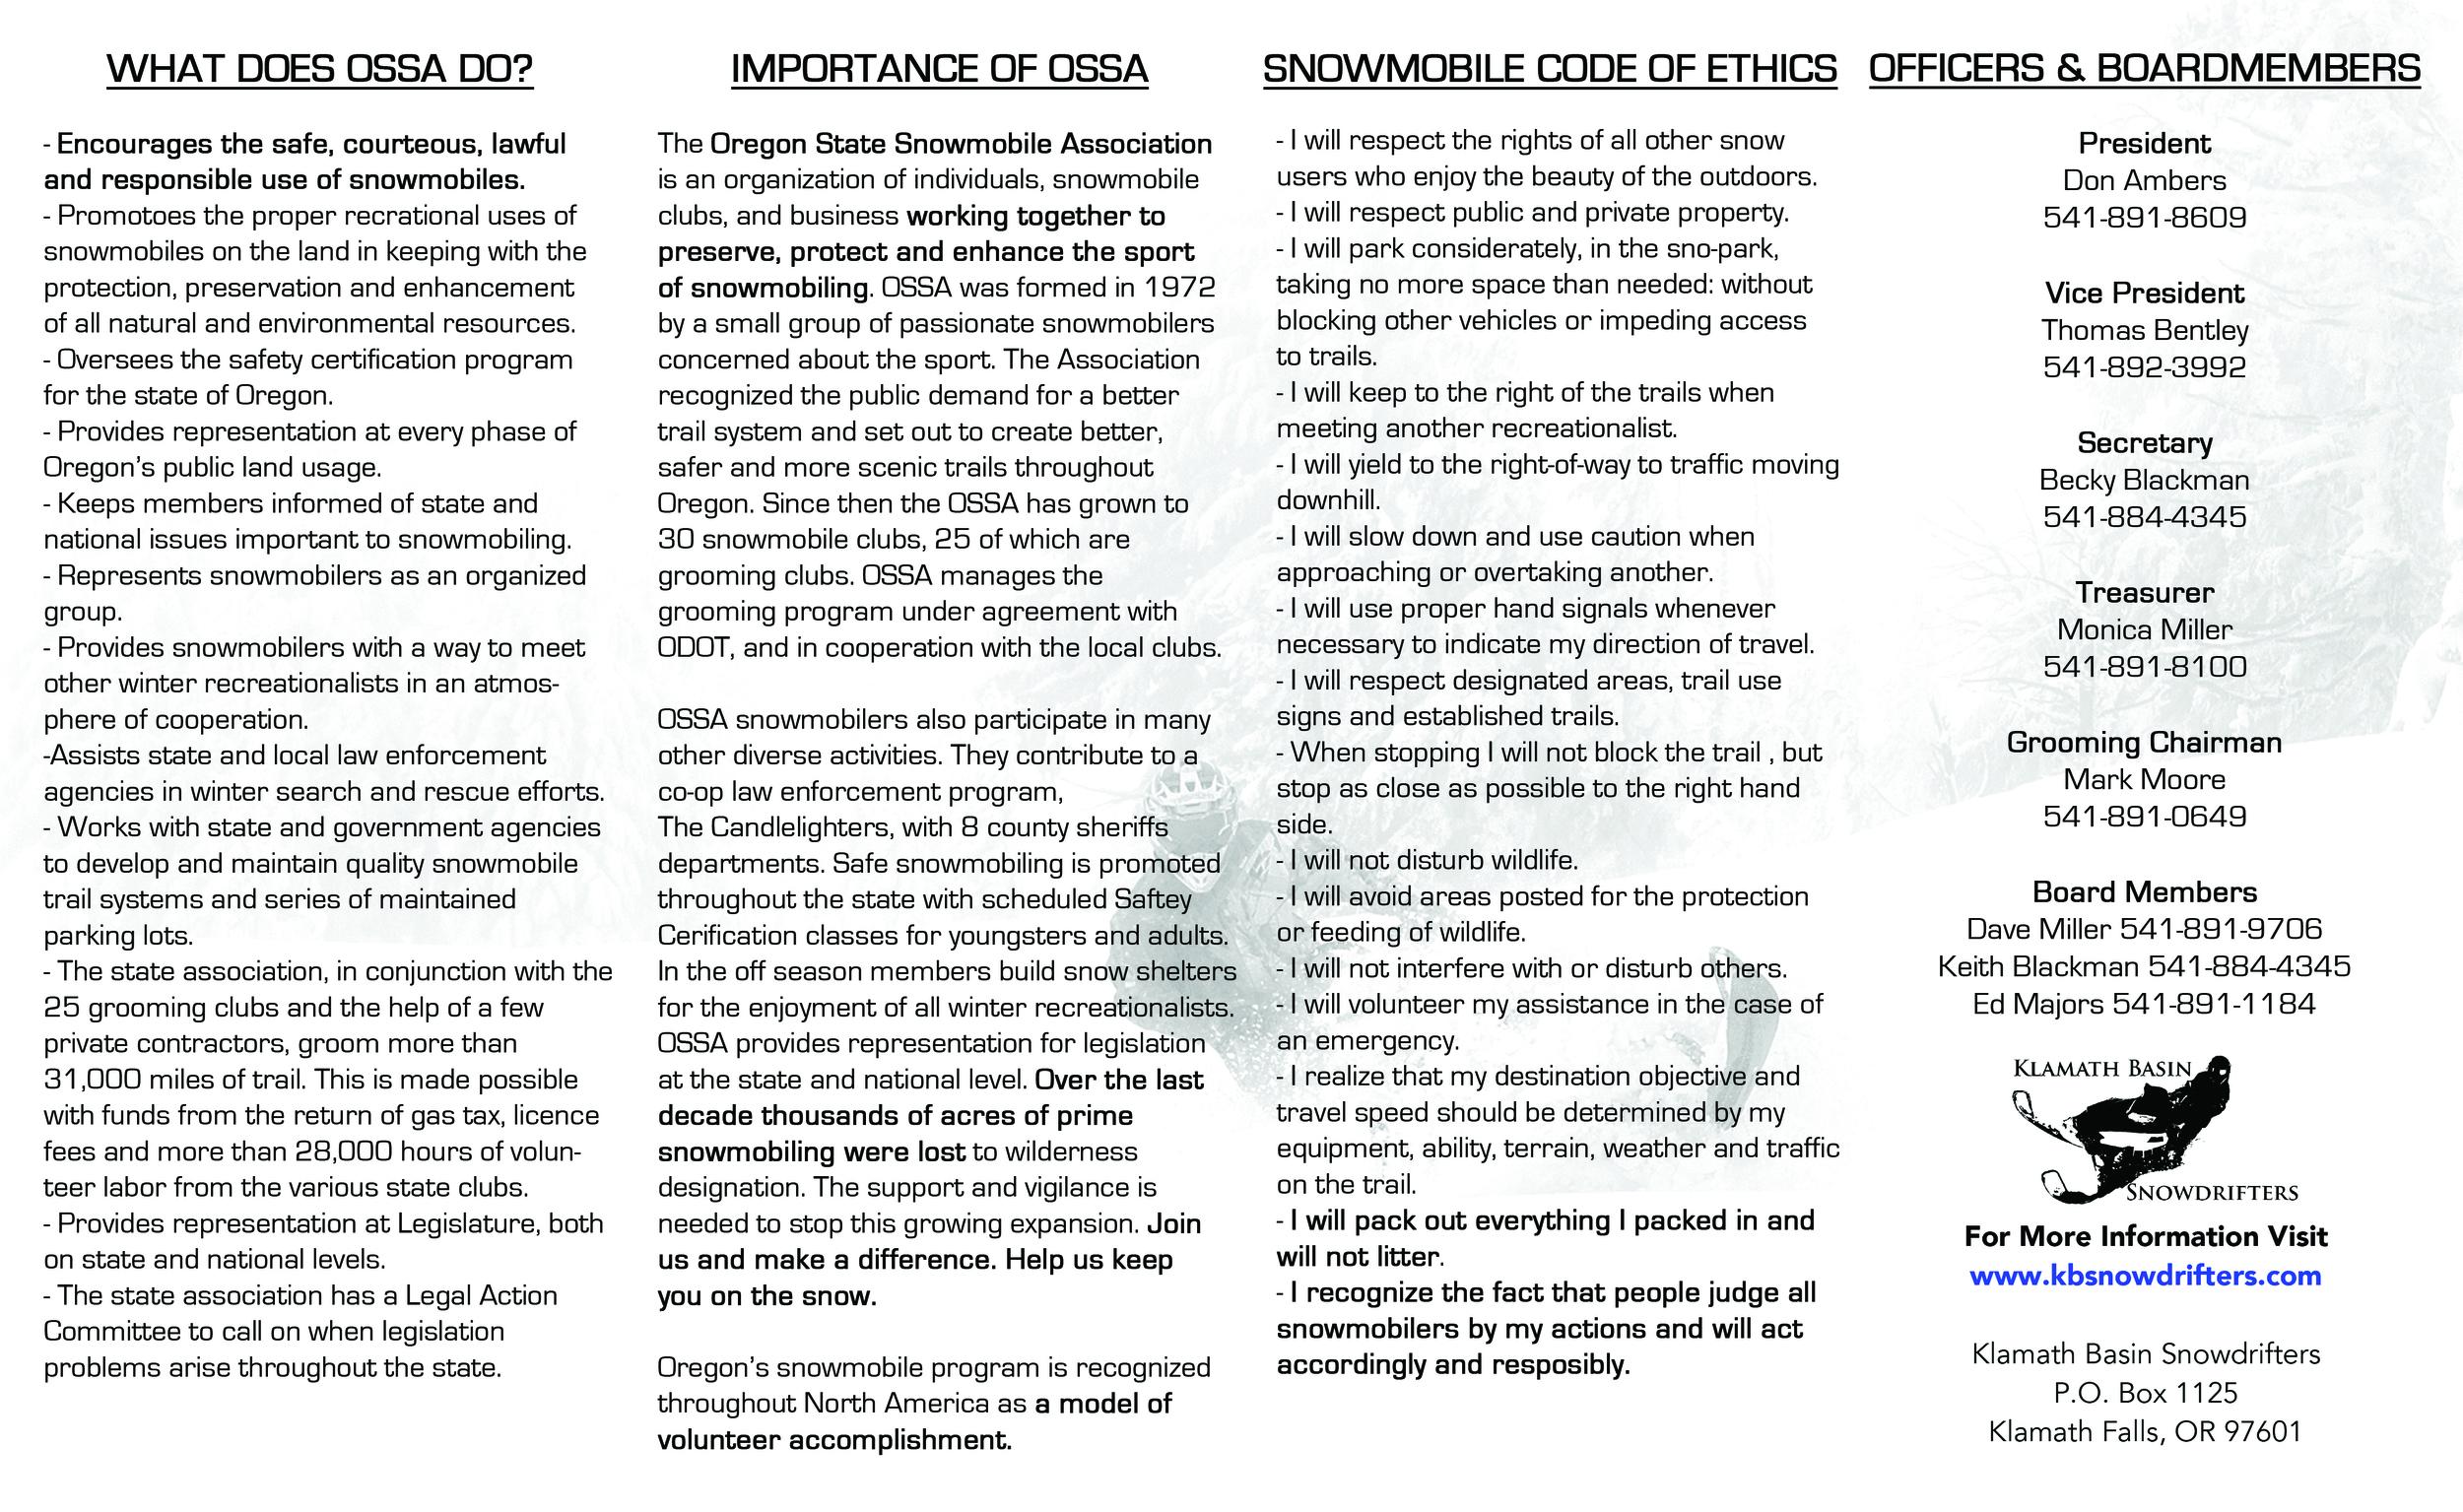 KBSD Brochure Back 2015.jpg